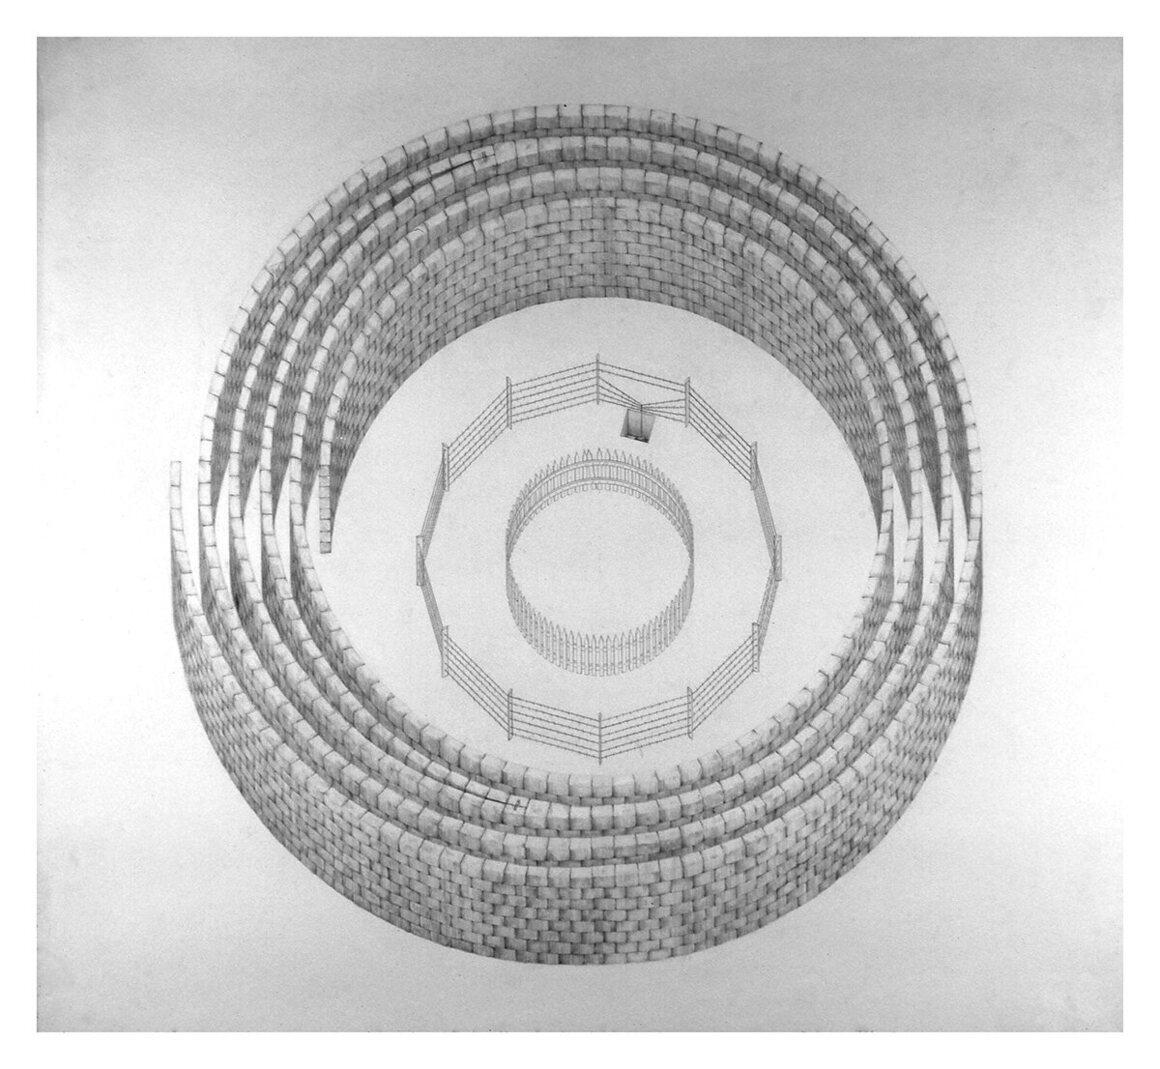 <em>Passage</em>, Liz Diller, Design III, 1976-77.